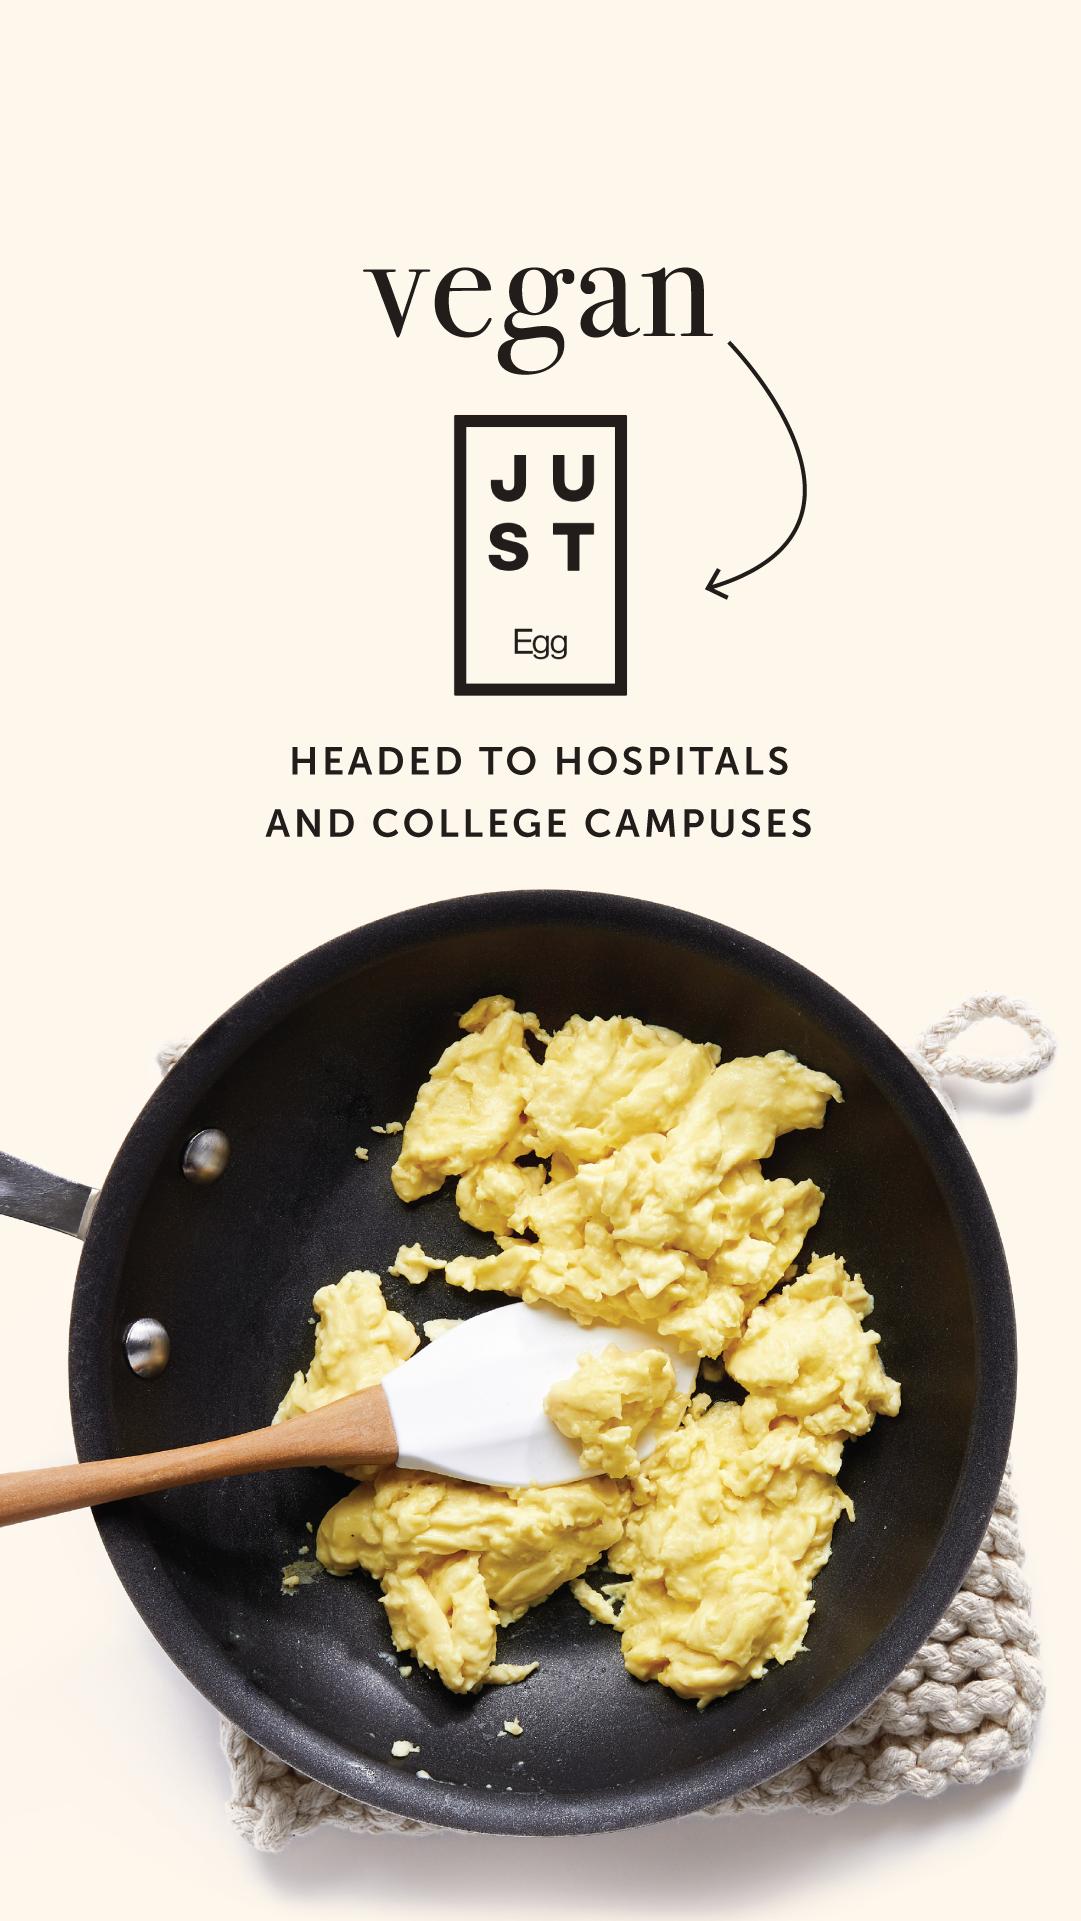 Vegan Just Egg Headed To Hospitals And College Campuses Chooseveg Recipes Vegan Eggs Vegan Egg Substitute